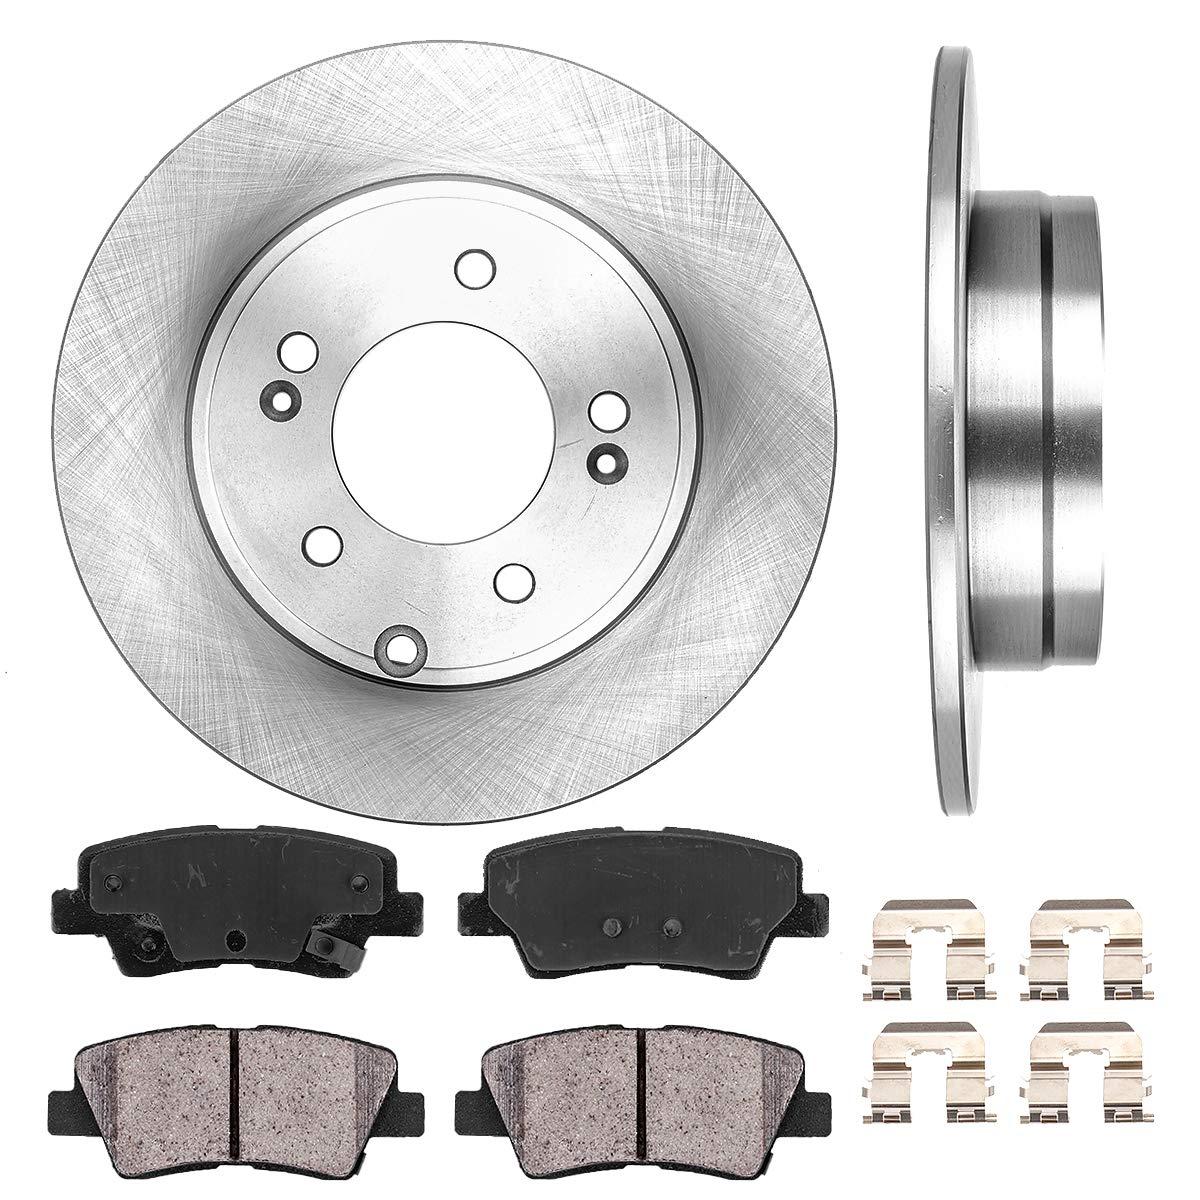 Fits 11 12 13 Sonata Optima Rear Drilled And Slotted Brake Rotors /& Ceramic Pads